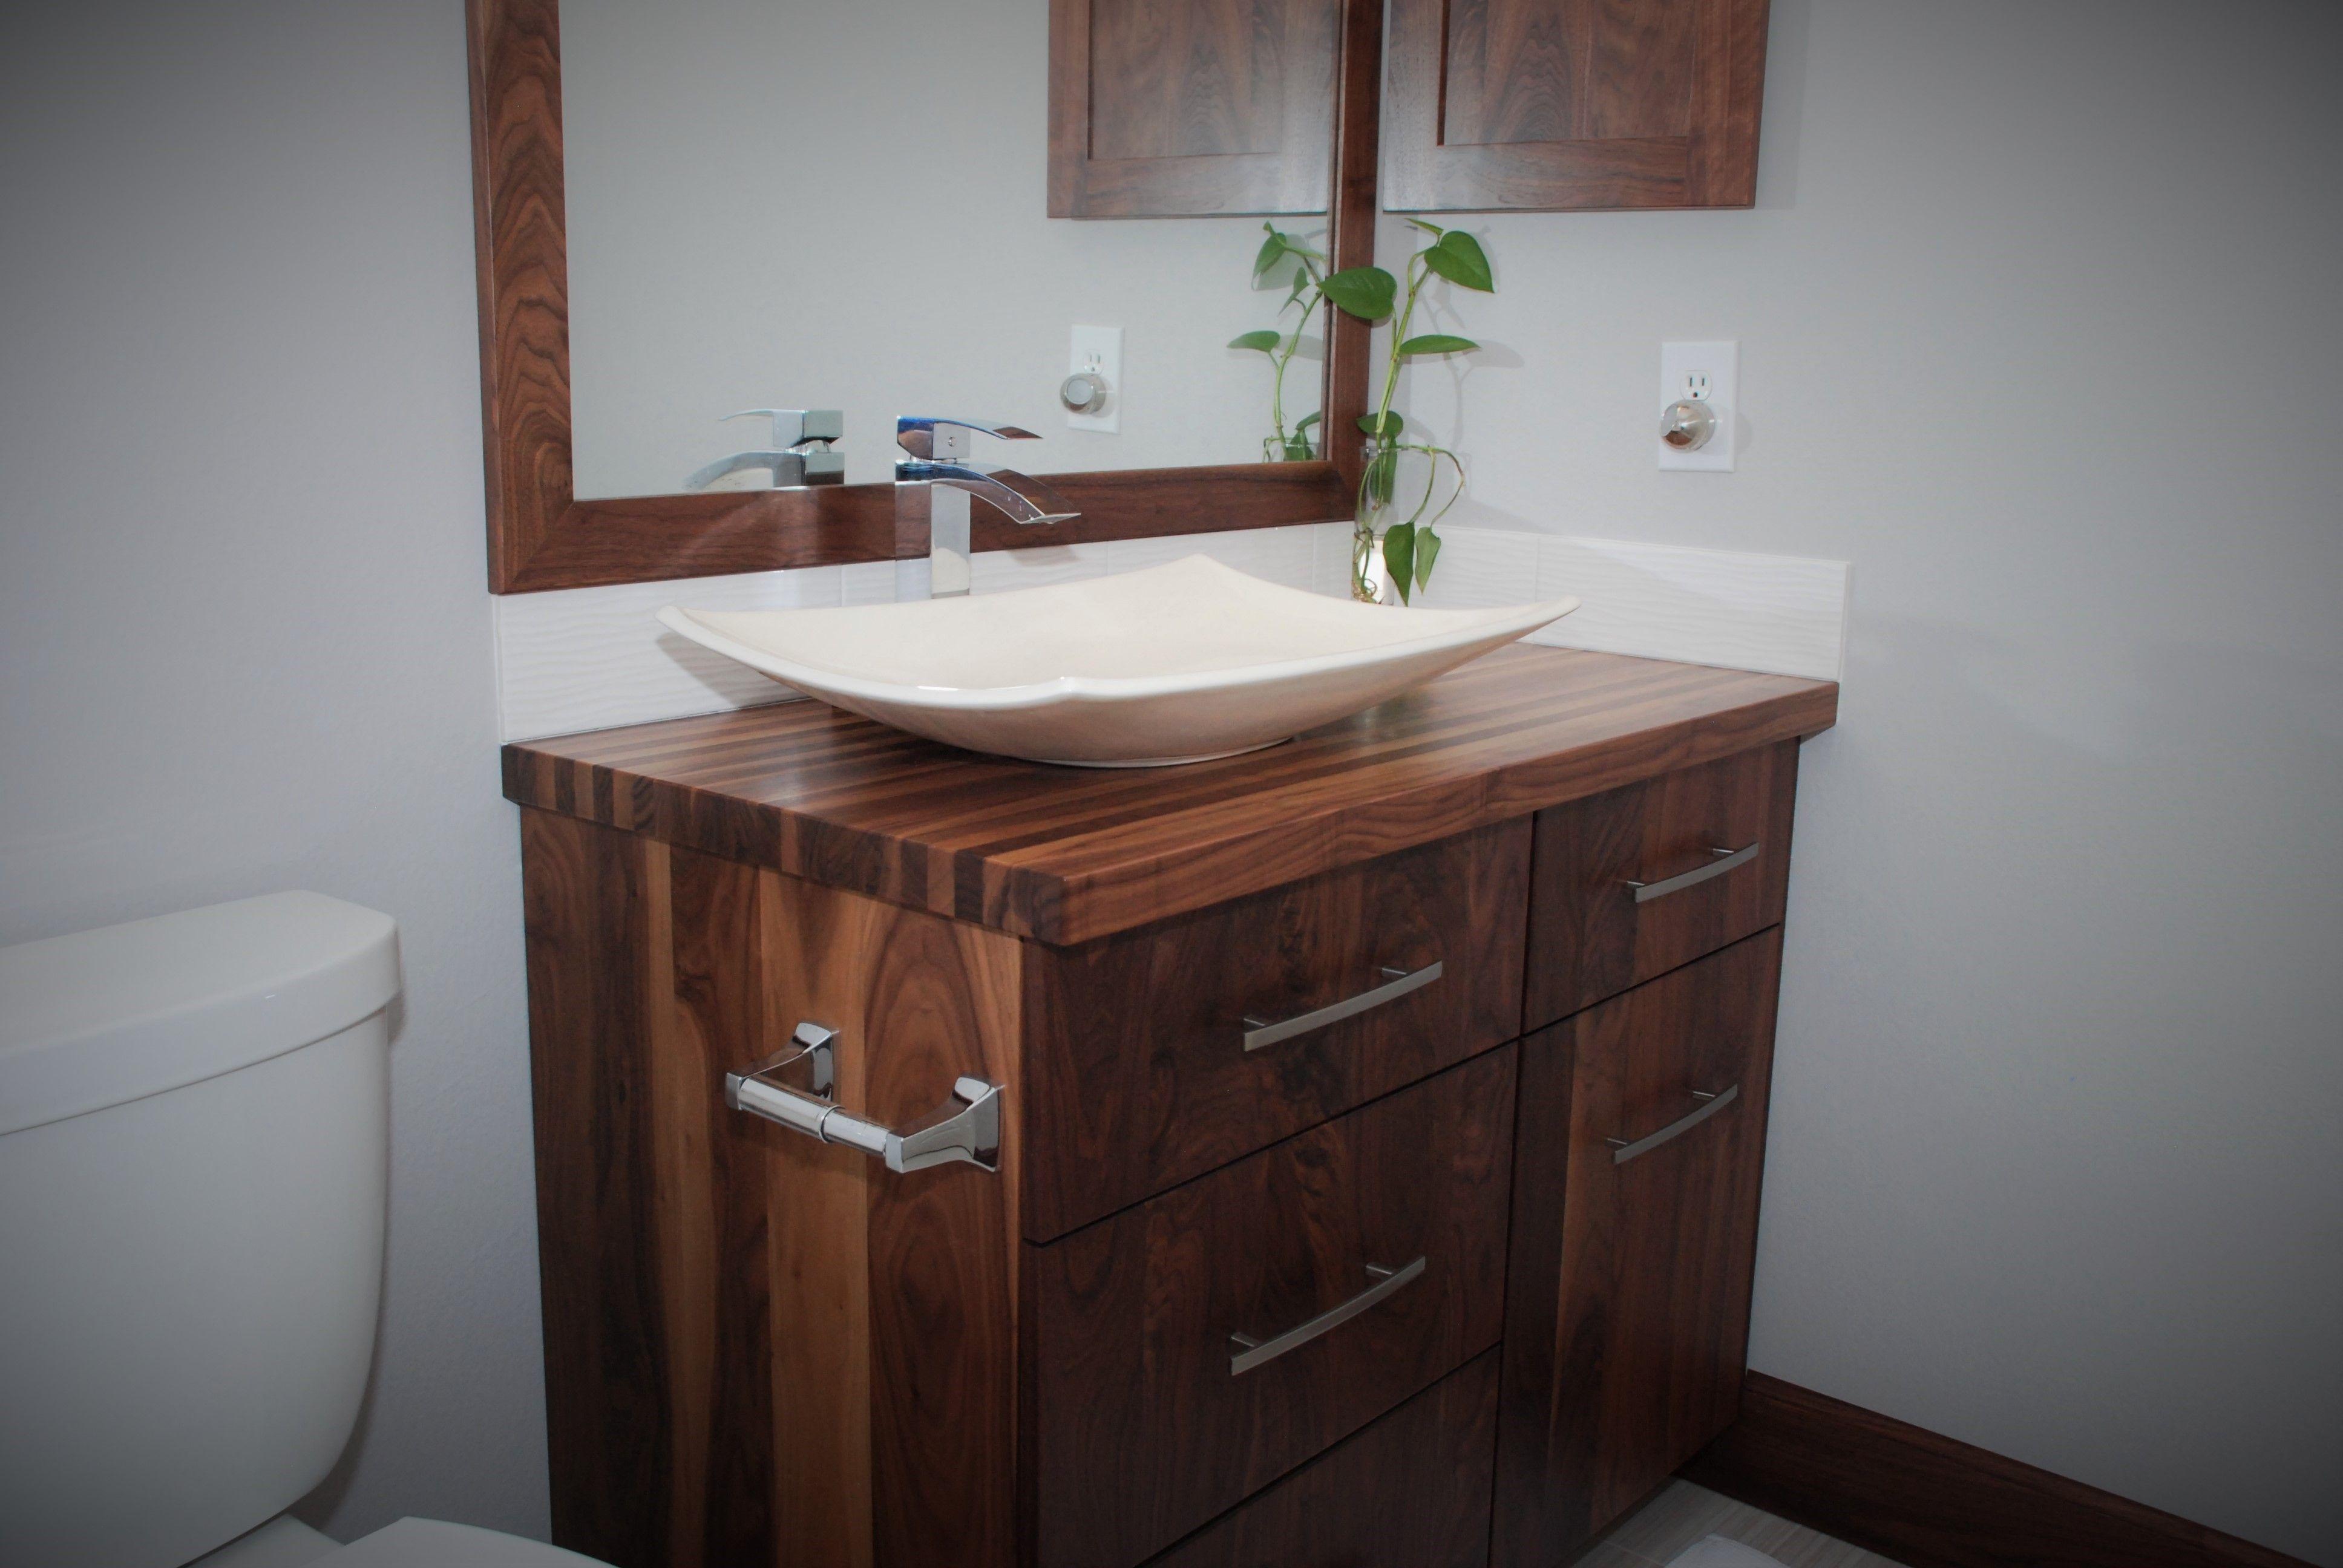 Custom All Walnut Bathroom Vanity By Belak Woodworking Llc Custommade Com